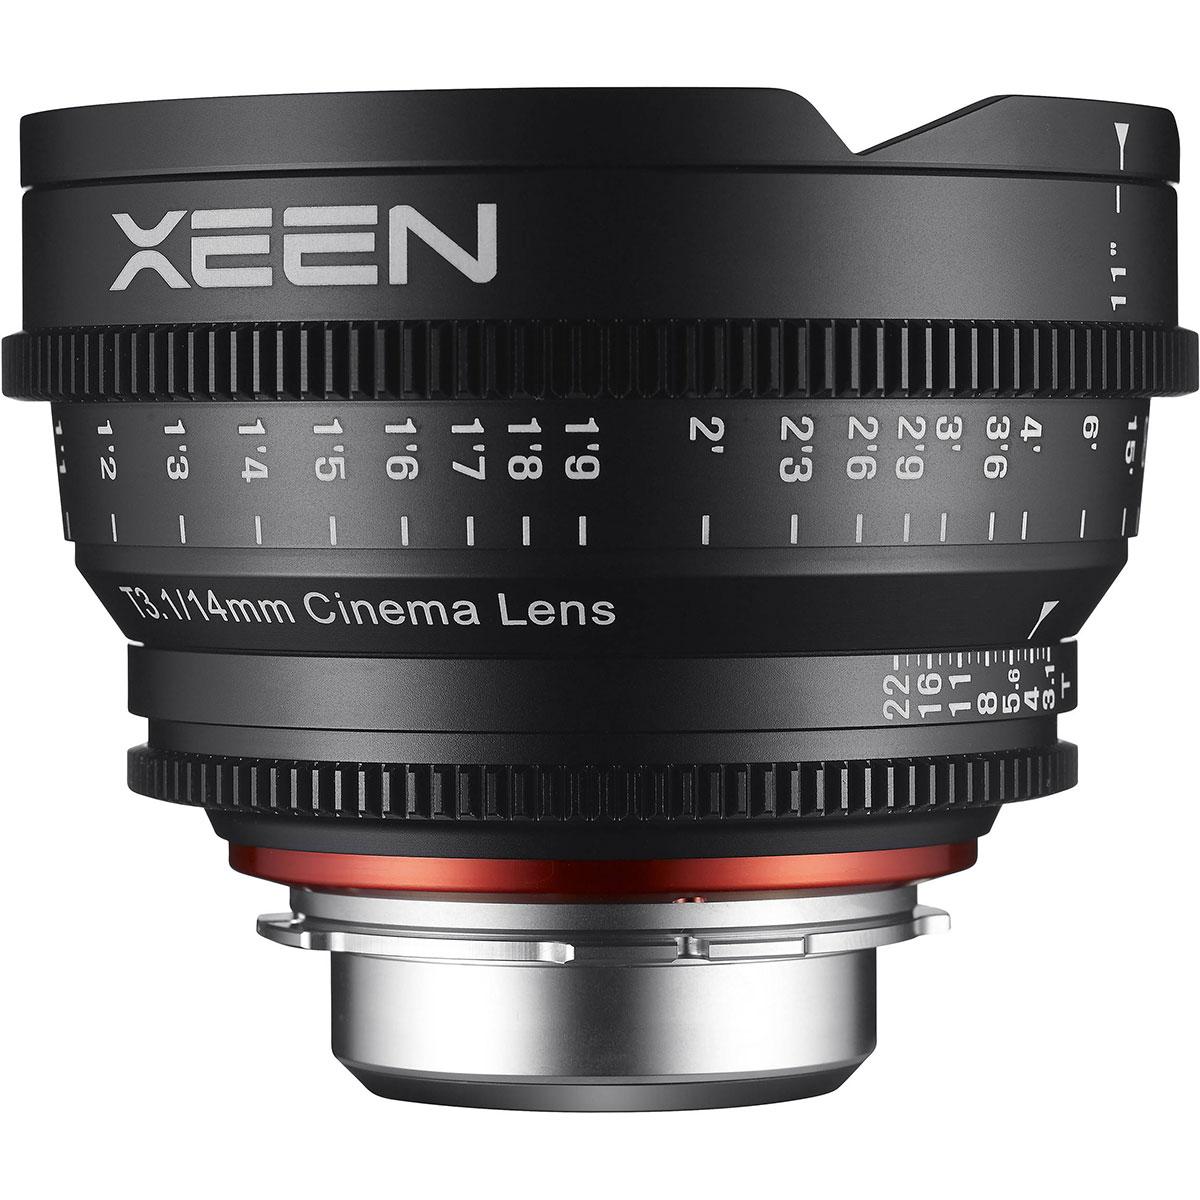 لنز سامیانگ مدل Xeen 14mm T3.1 مناسب برای دوربین سونی